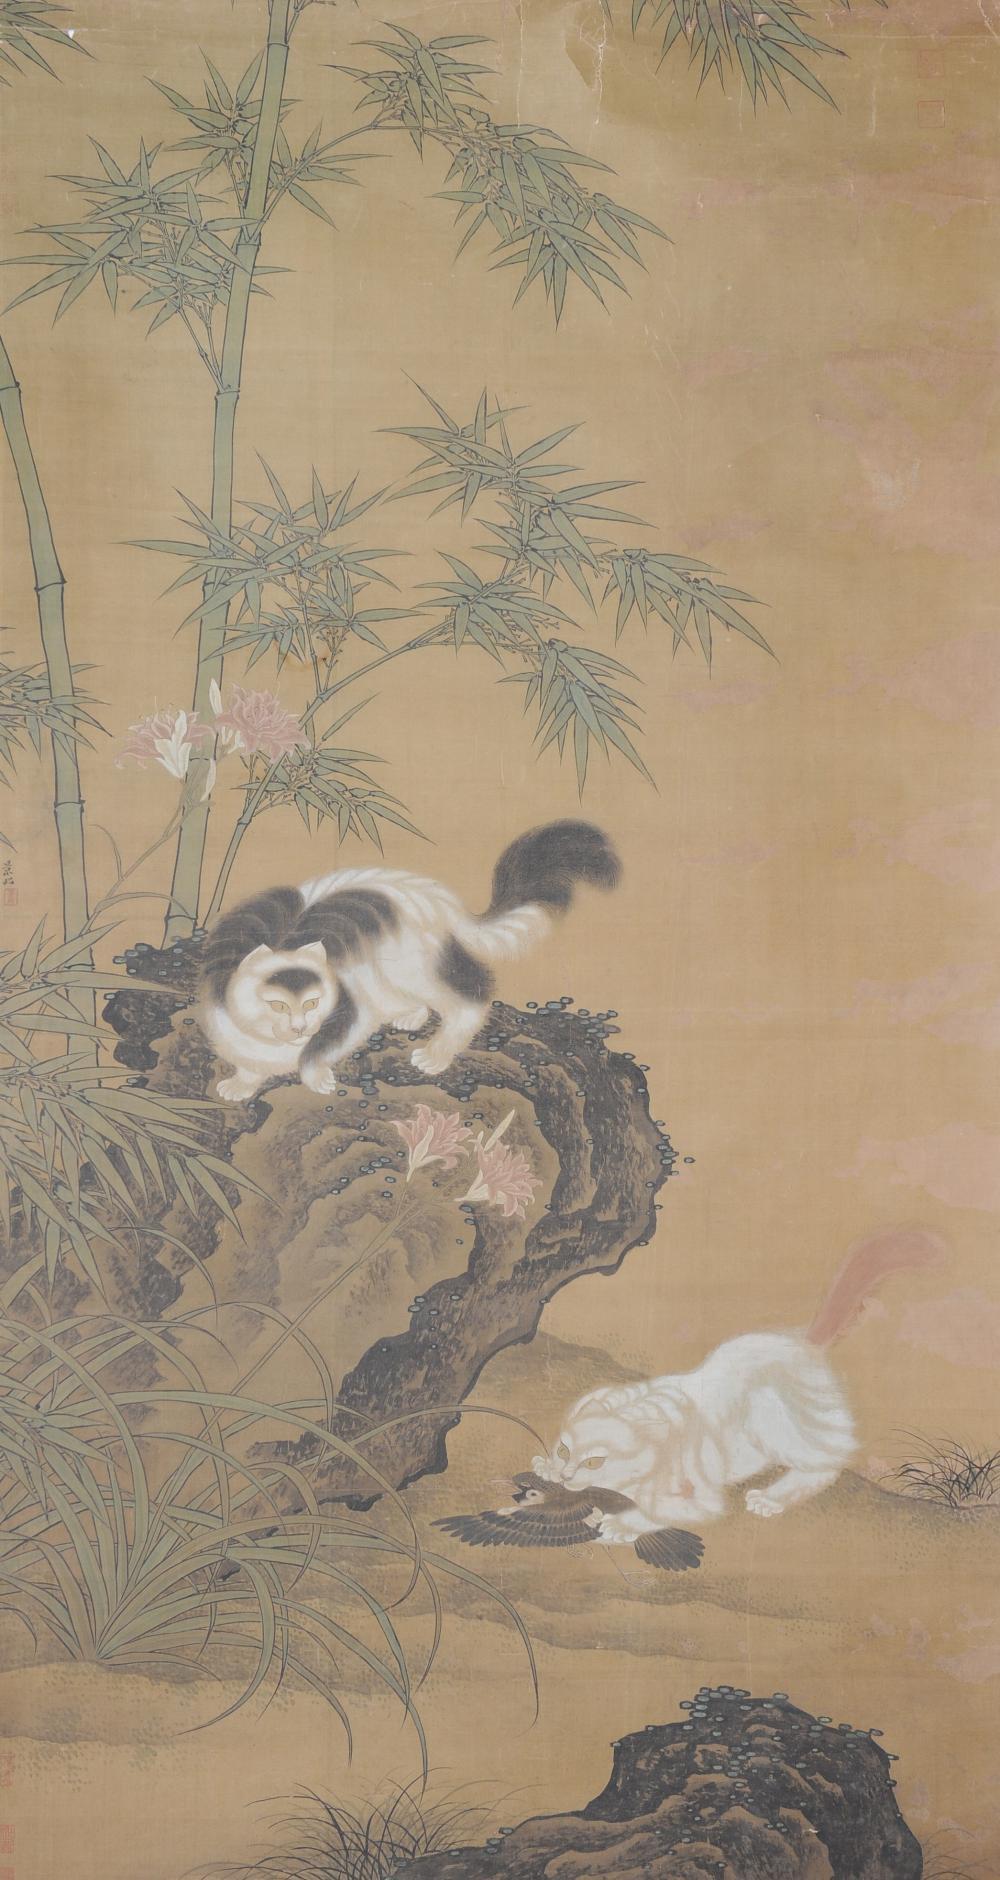 PAINTING OF BAMBOO & CATS, ATTRIB. BIAN JINGZHAO